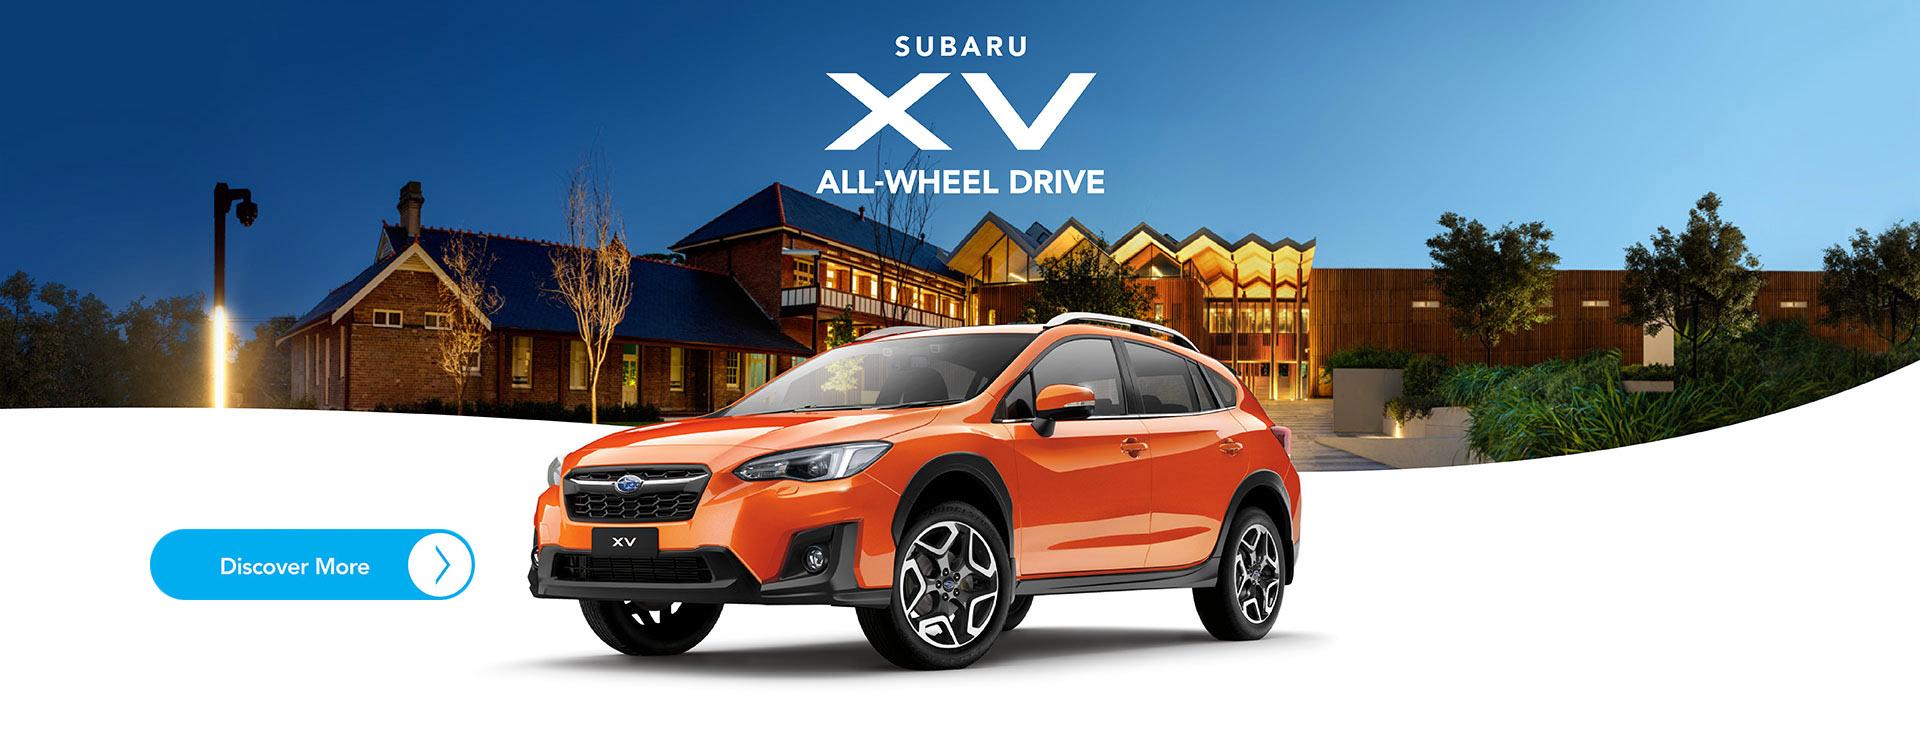 New Subaru XV, including Hybrid e-Boxer, now available at Cricks Subaru, Sunshine Coast. Test Drive Today!